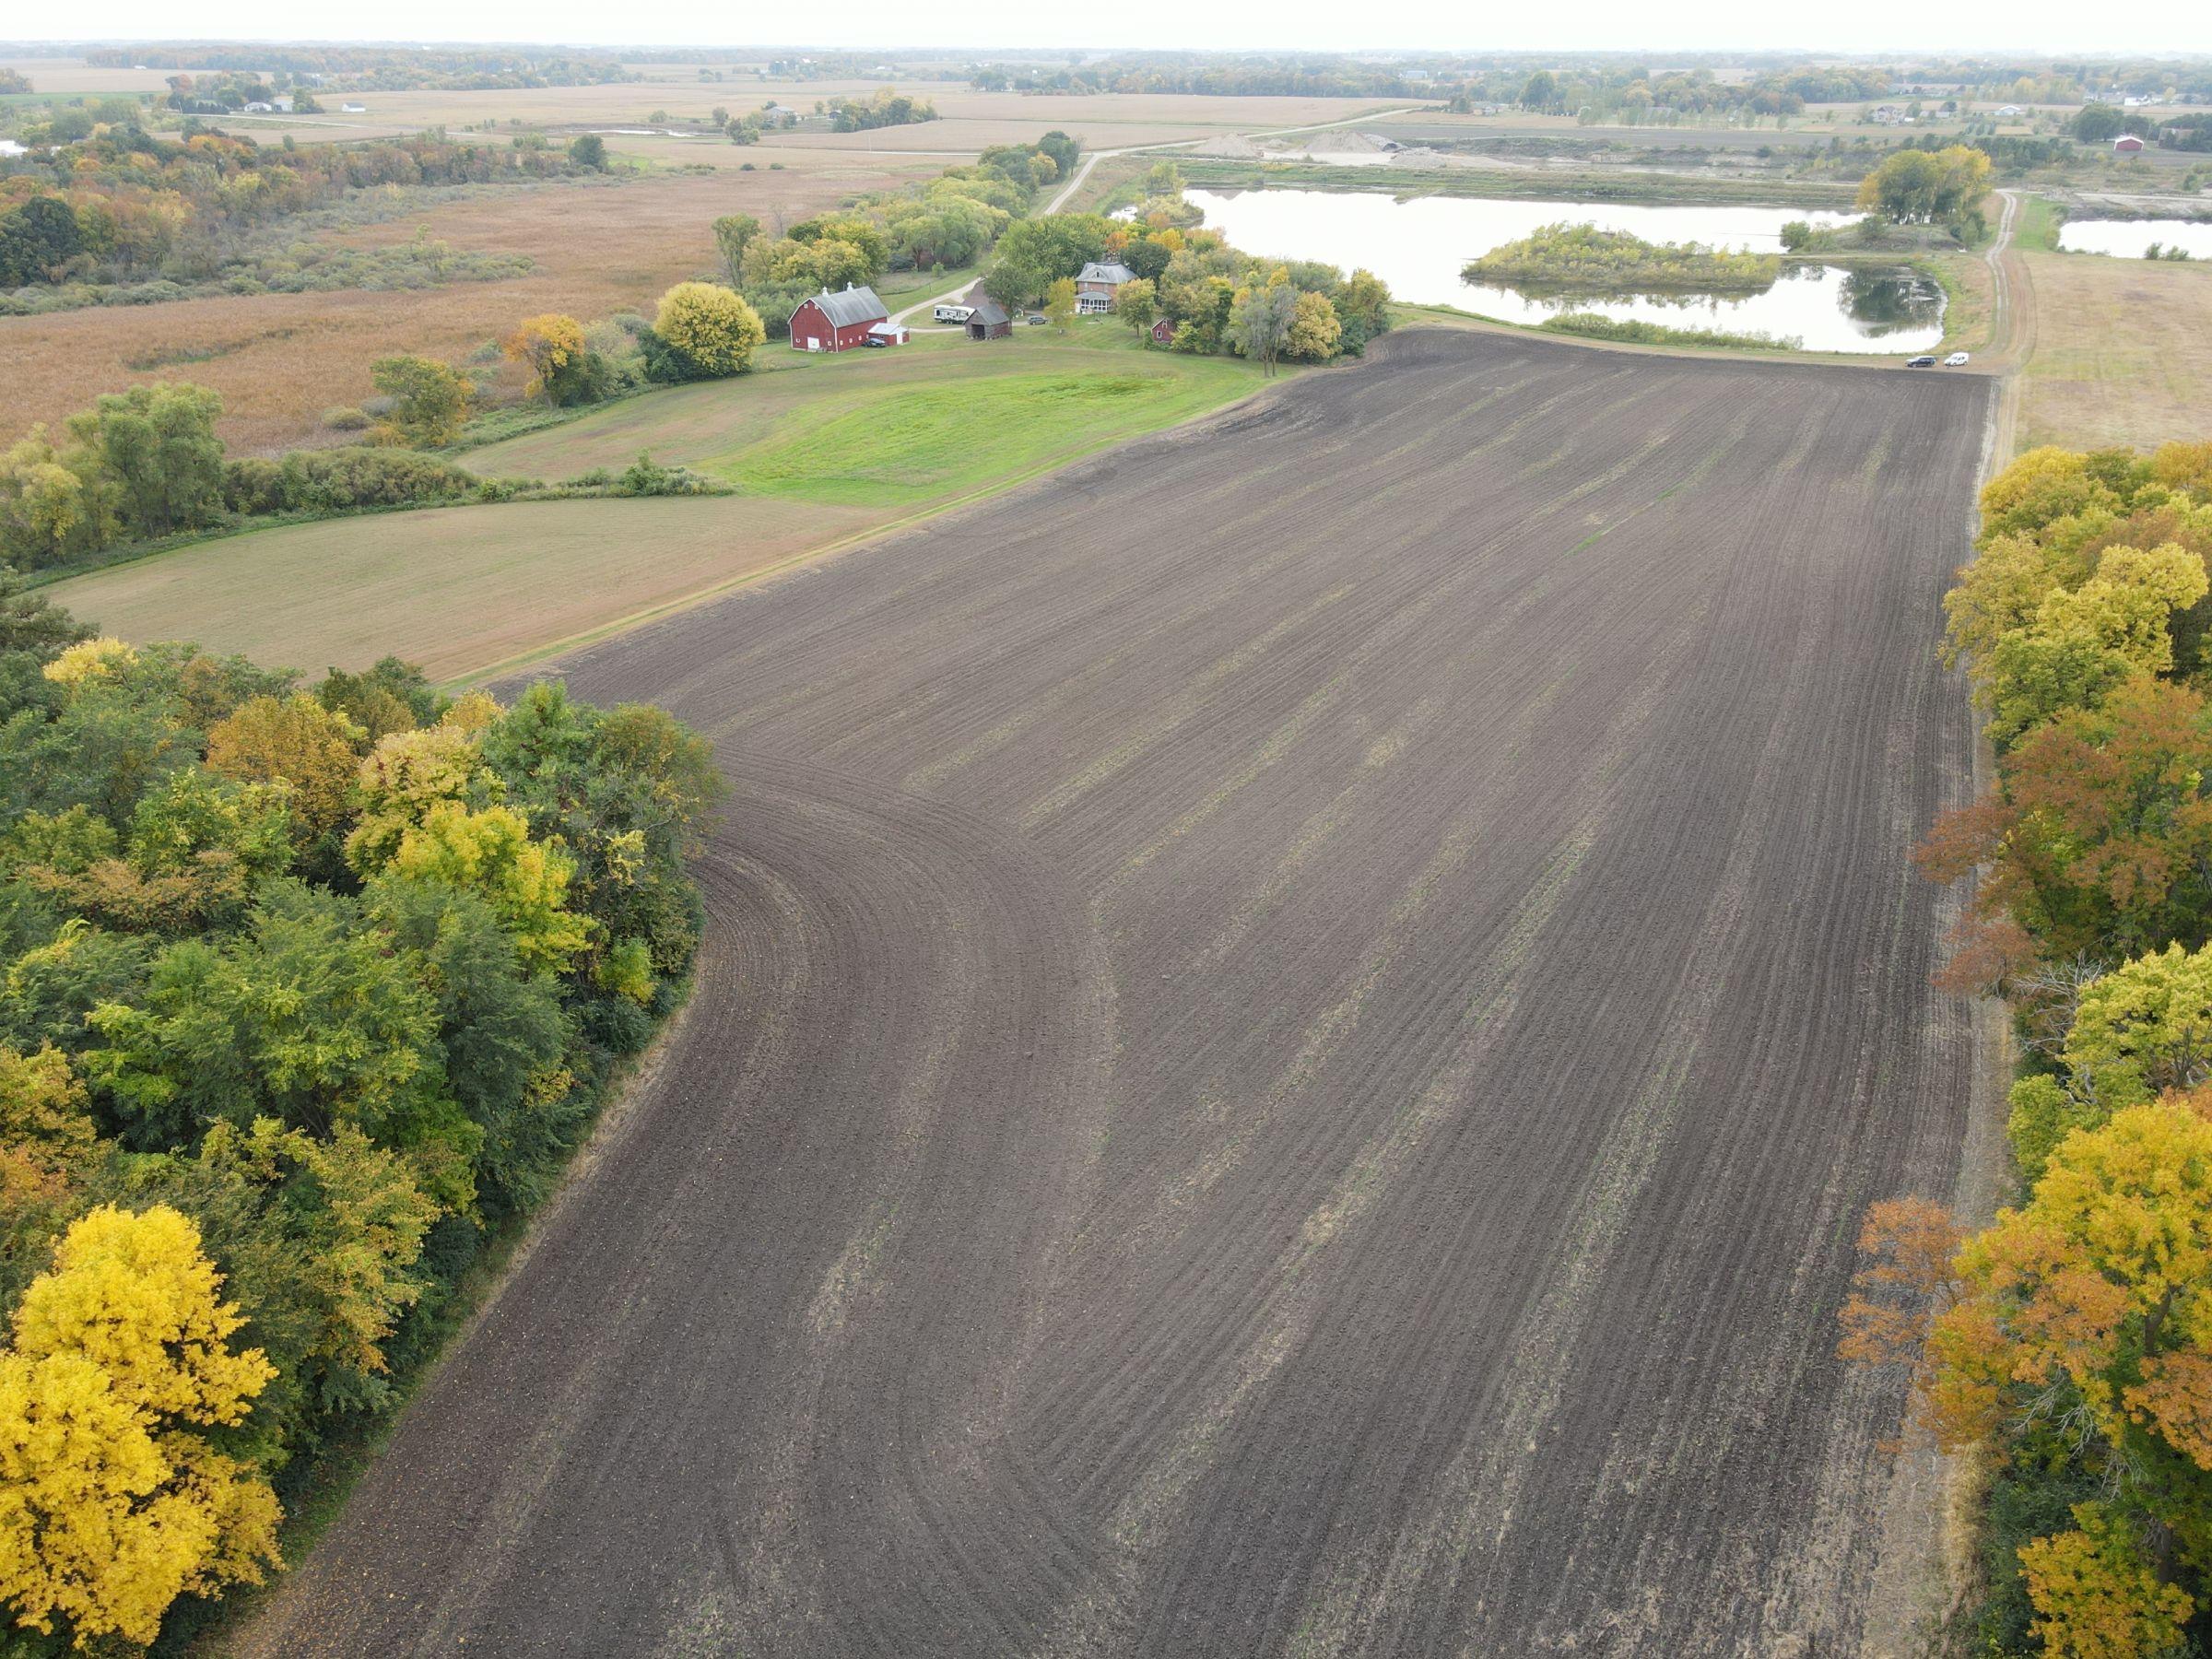 residential-land-mcleod-county-minnesota-80-acres-listing-number-15182-6-2020-10-07-142945.JPG